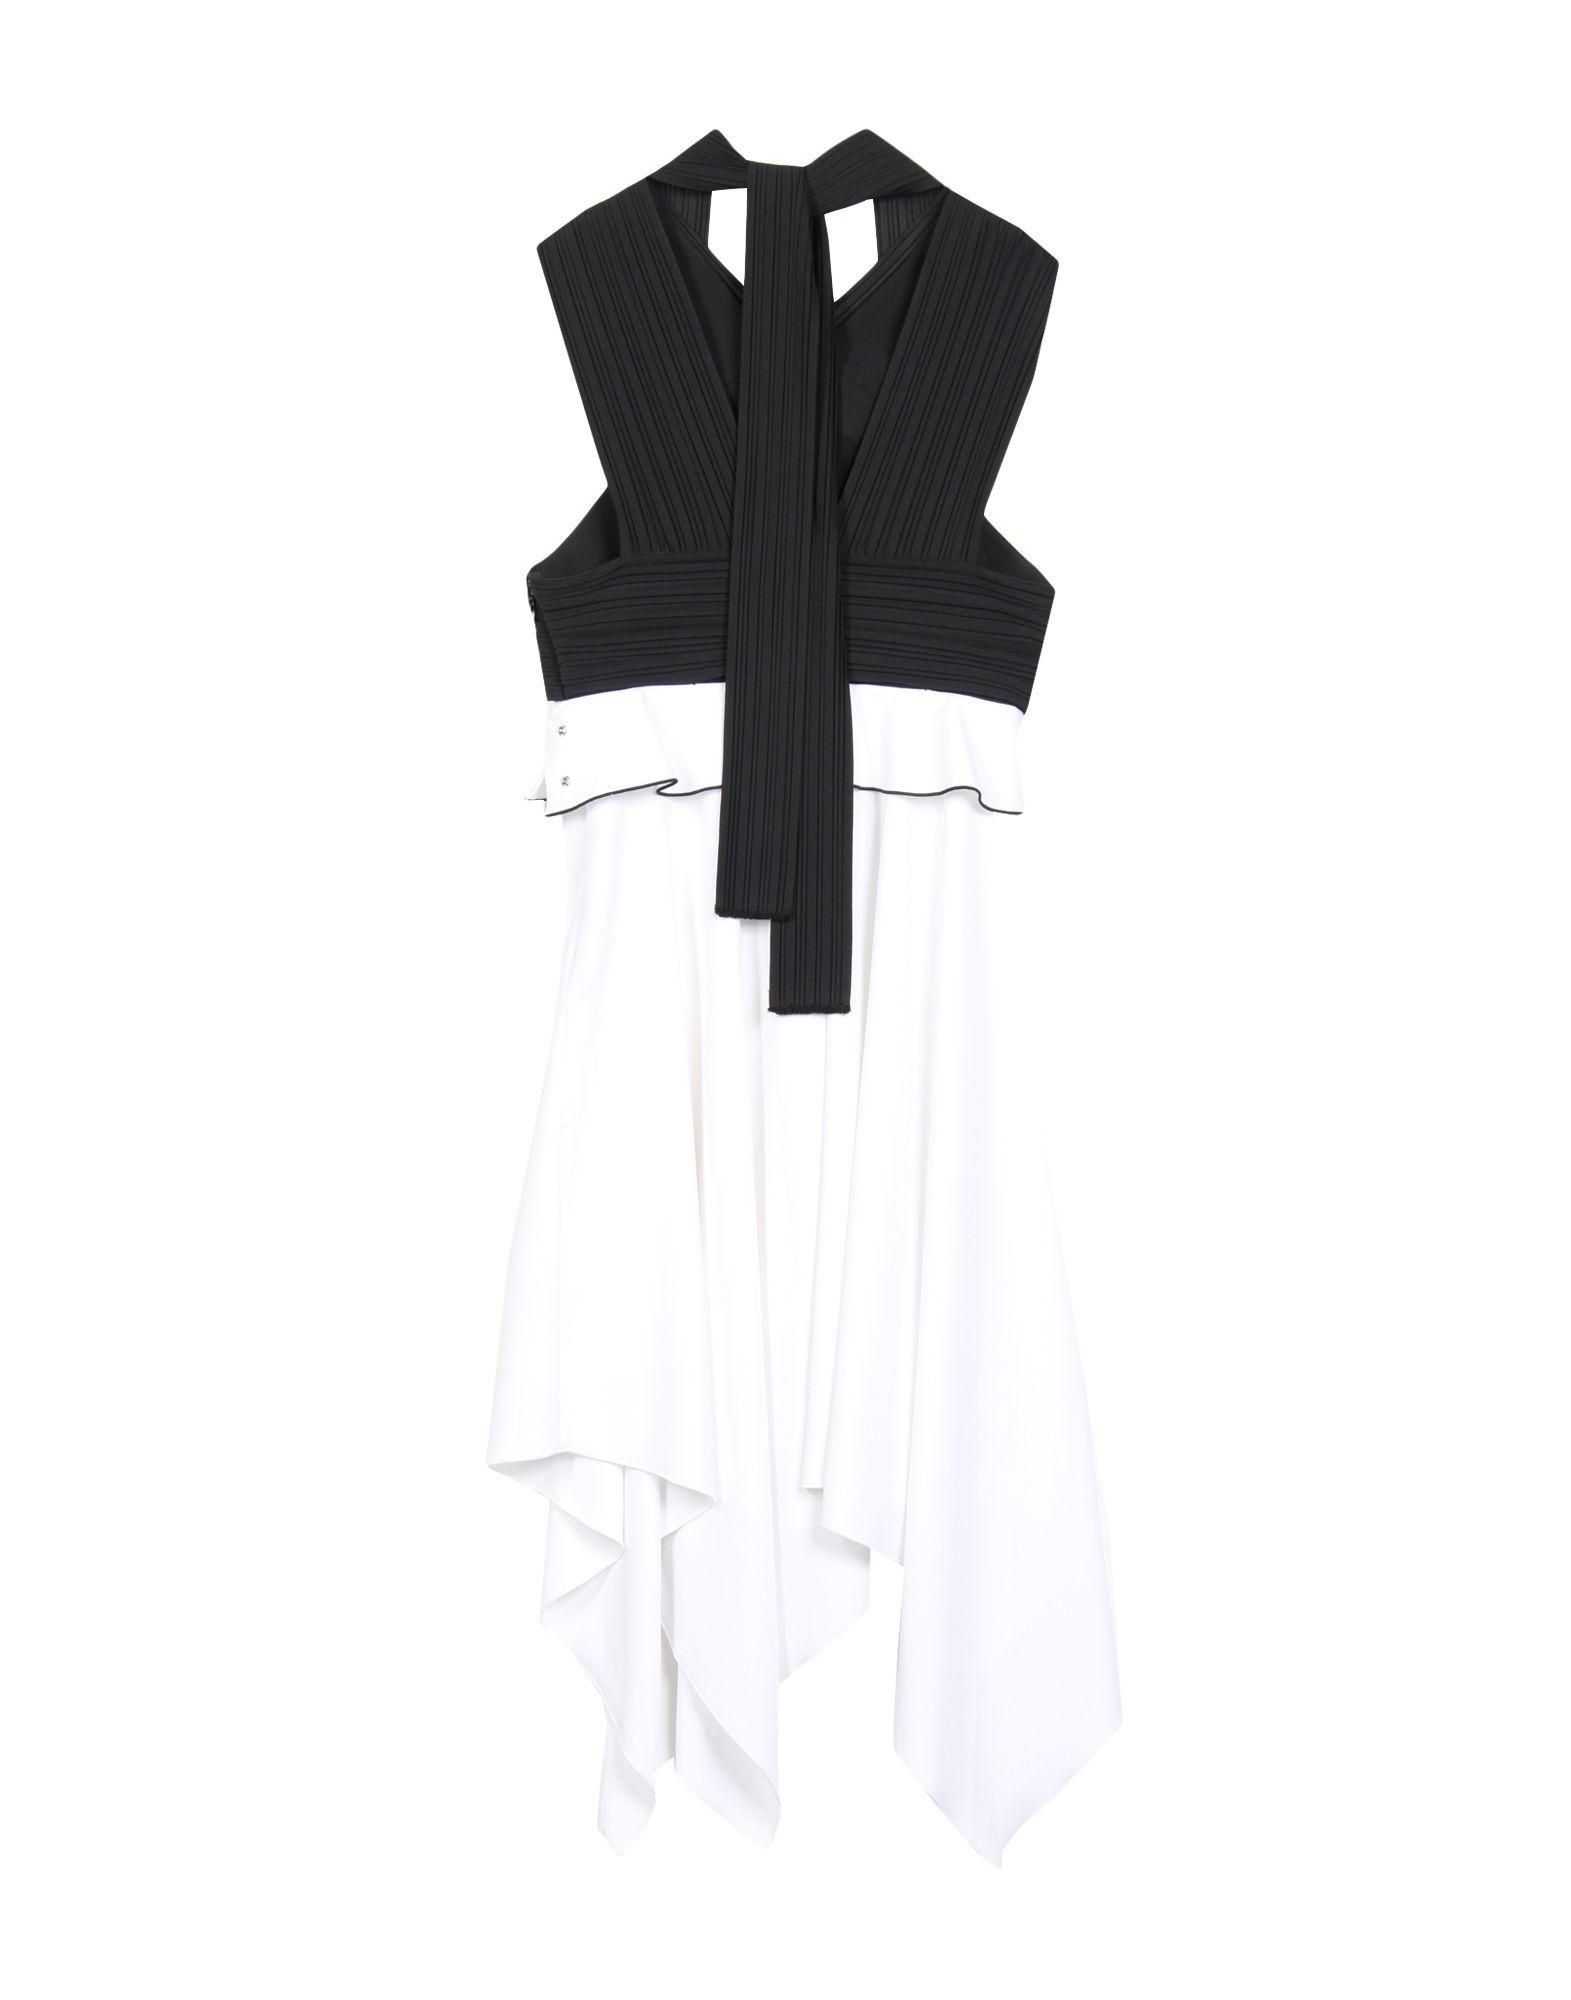 Proenza Schouler Crepe Monochrome Dress